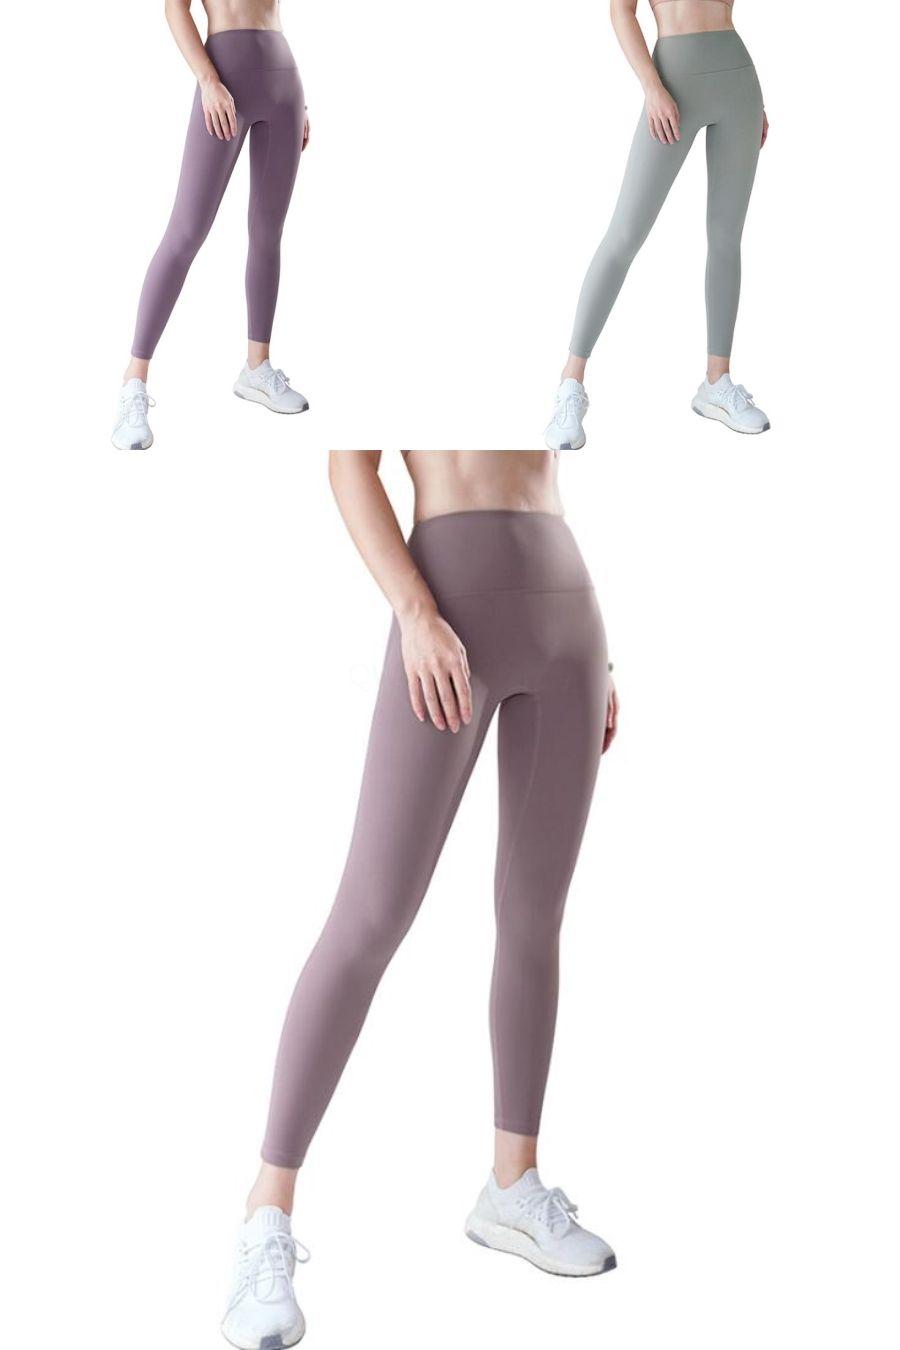 2020 Athleisure Leggings pour les femmes Mesh Splice Fitness Leggins Pantalons Slim Noir Legging Taille Plus YWYS1095 # 722